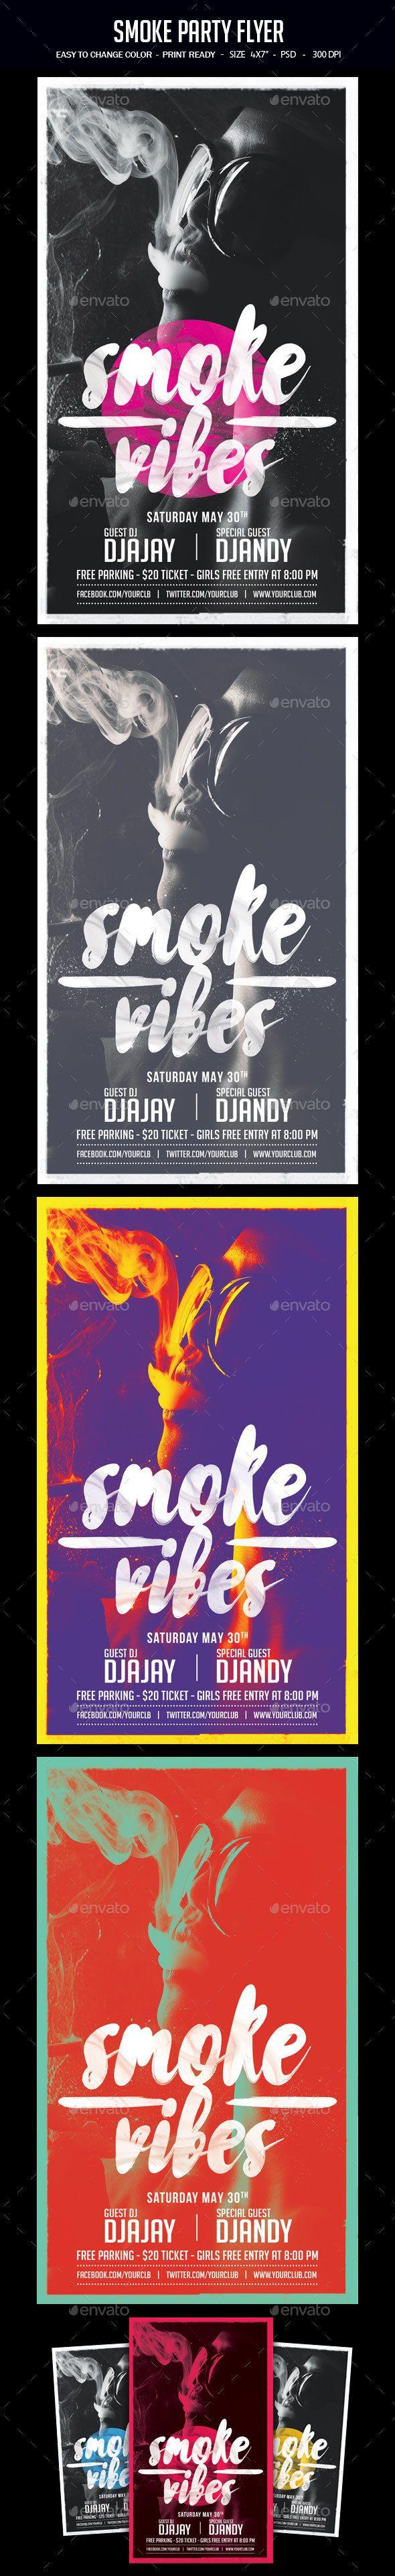 Poster design free - Smoke Party Flyer